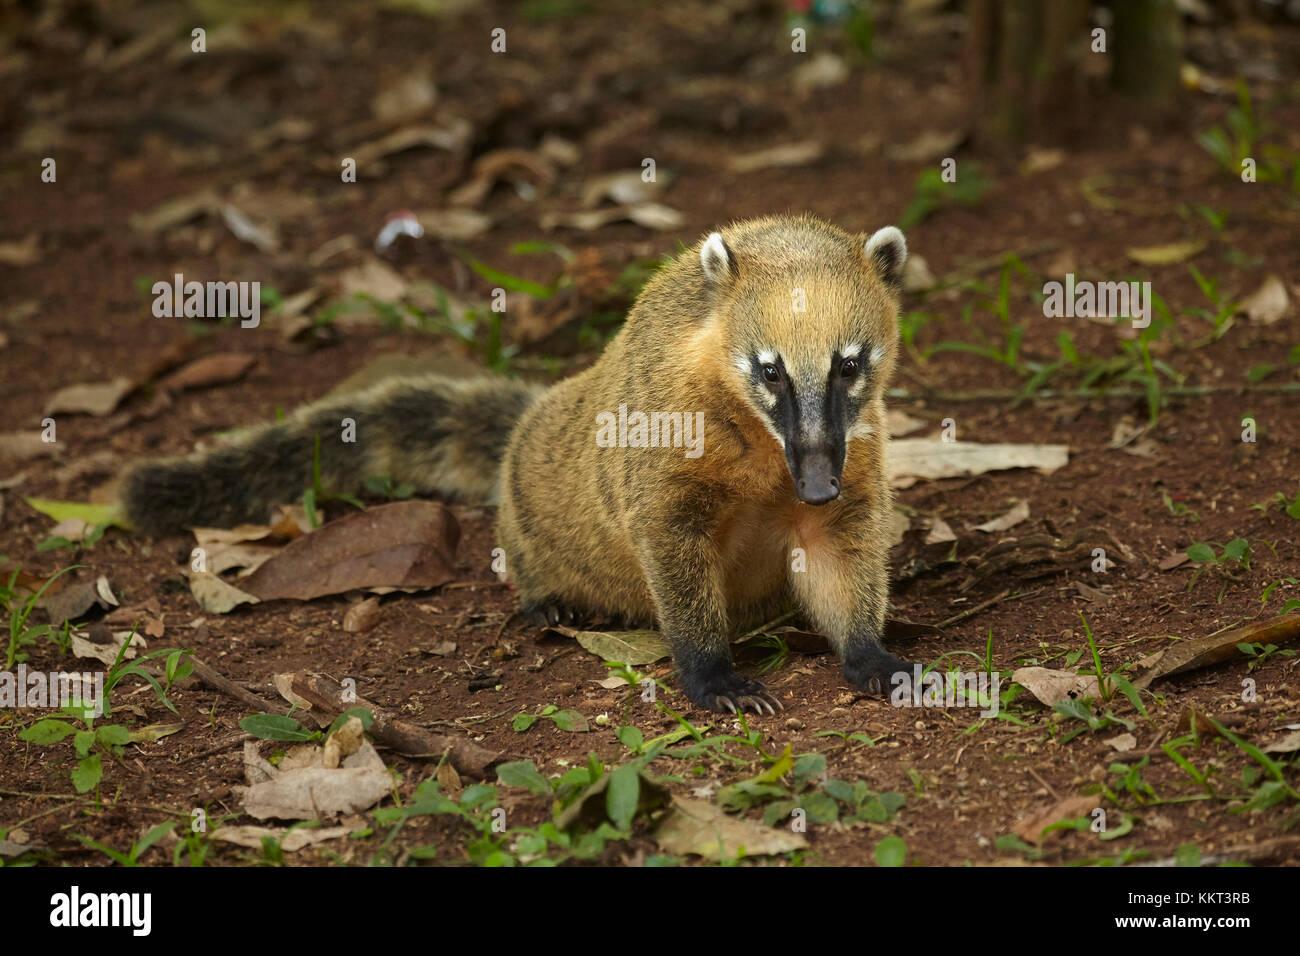 South American coati (Nasua nasua), Iguazu Falls, Argentina, South America Stock Photo